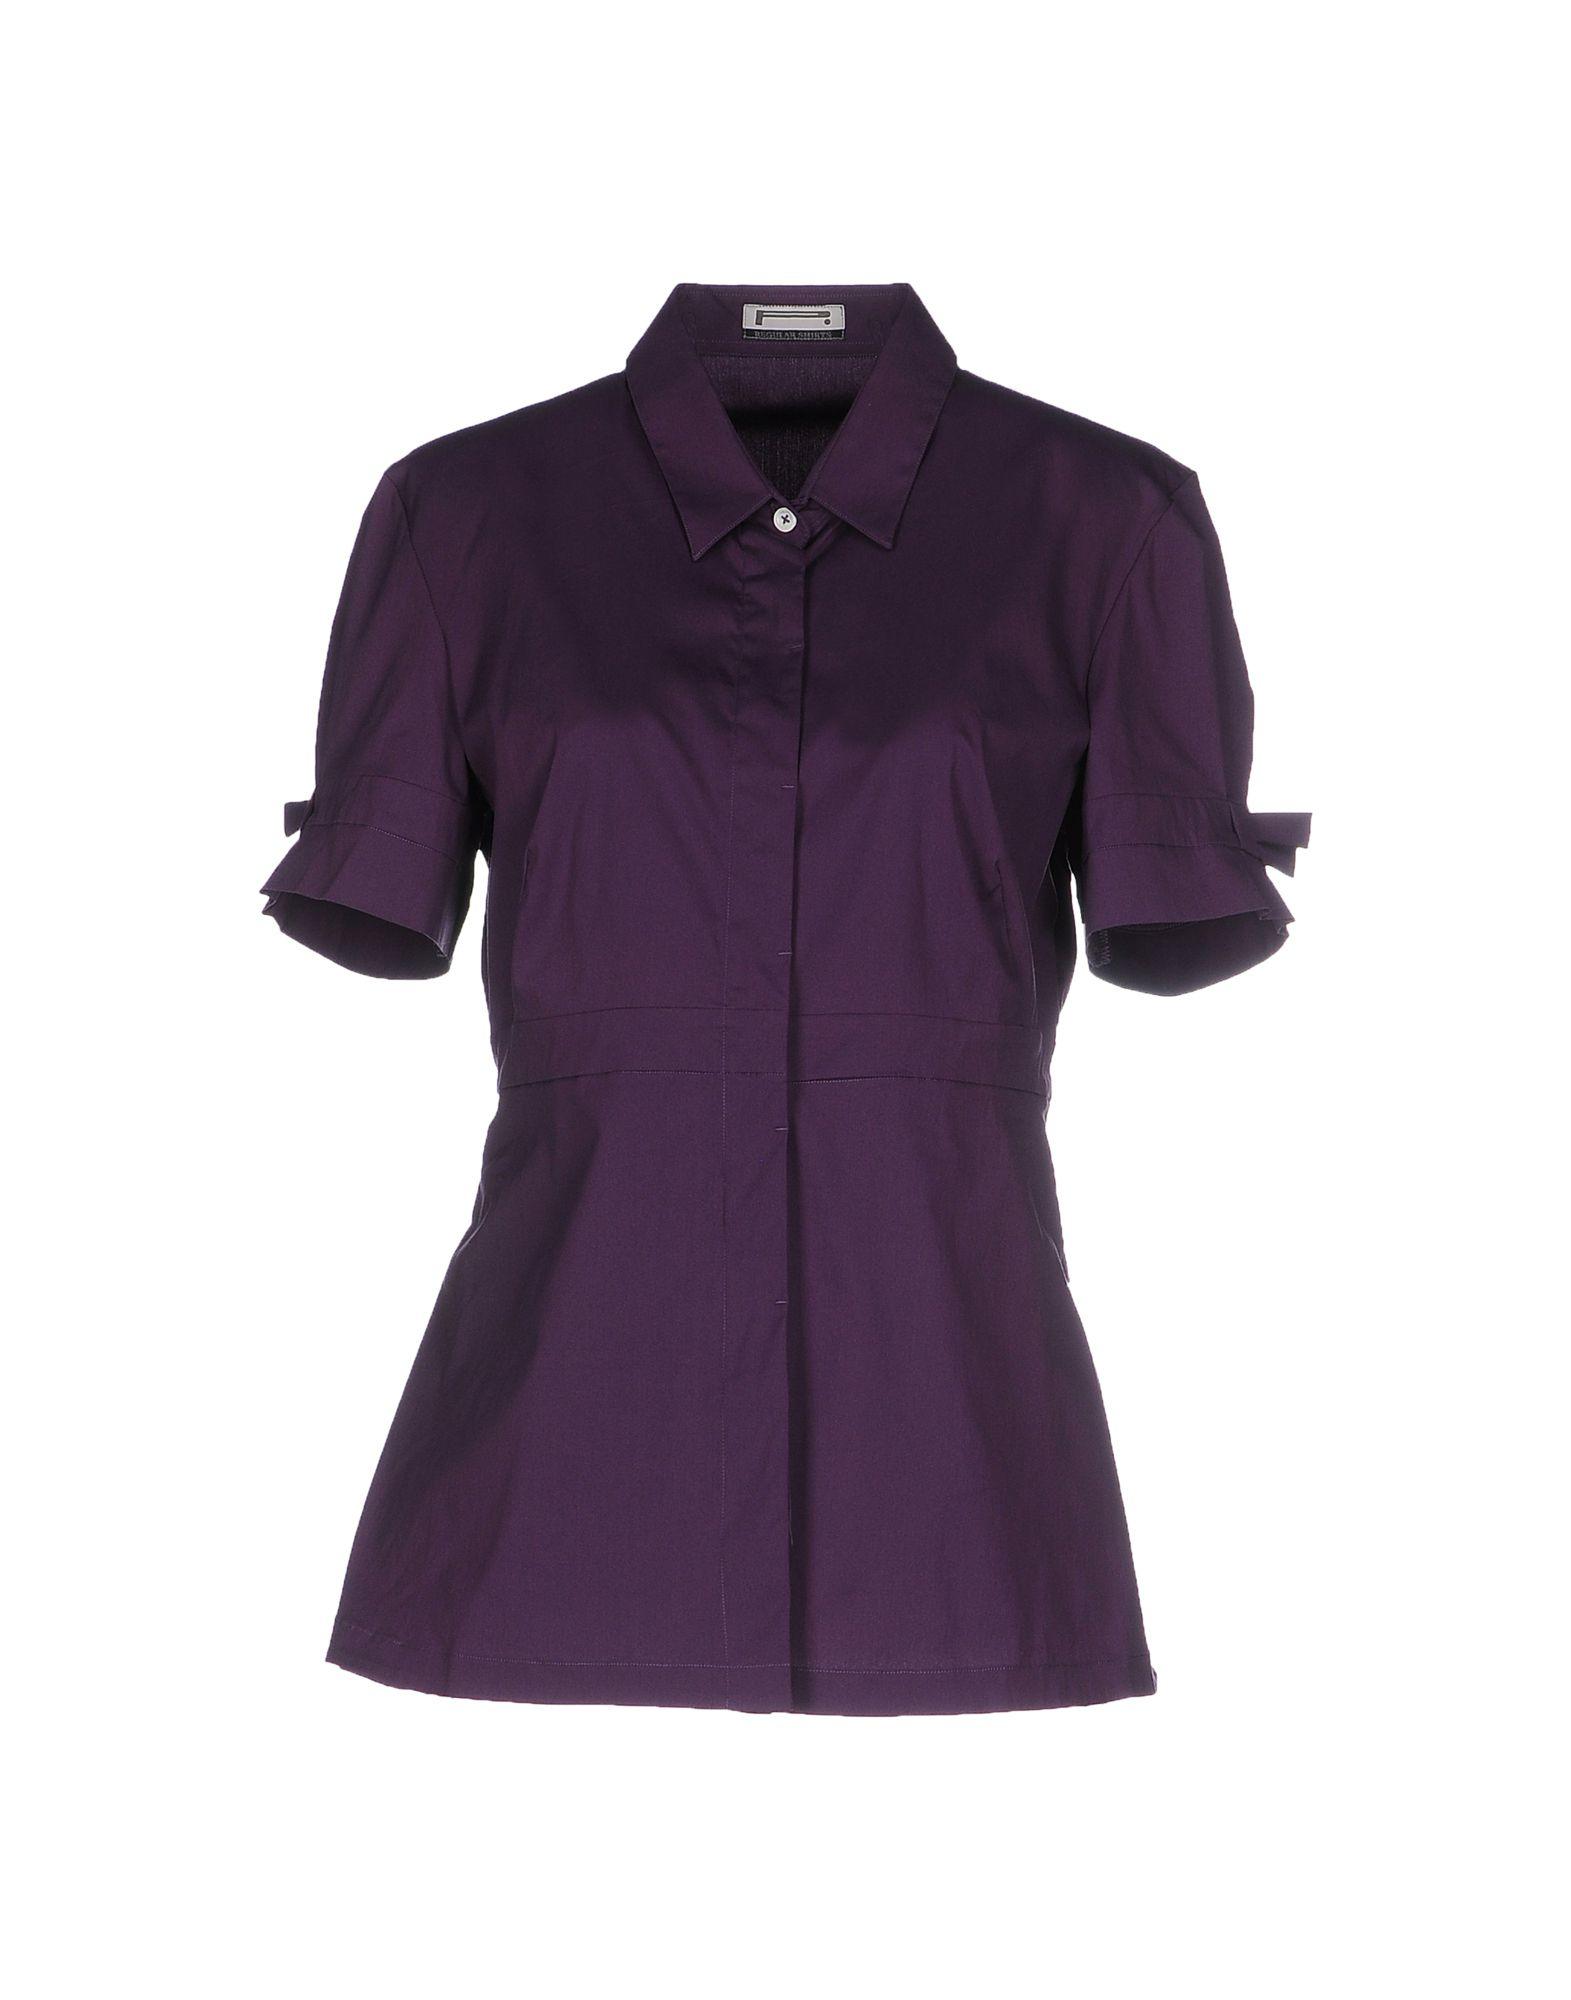 Pirelli pzero Shirt in Purple (Dark purple) - Save 50% | Lyst